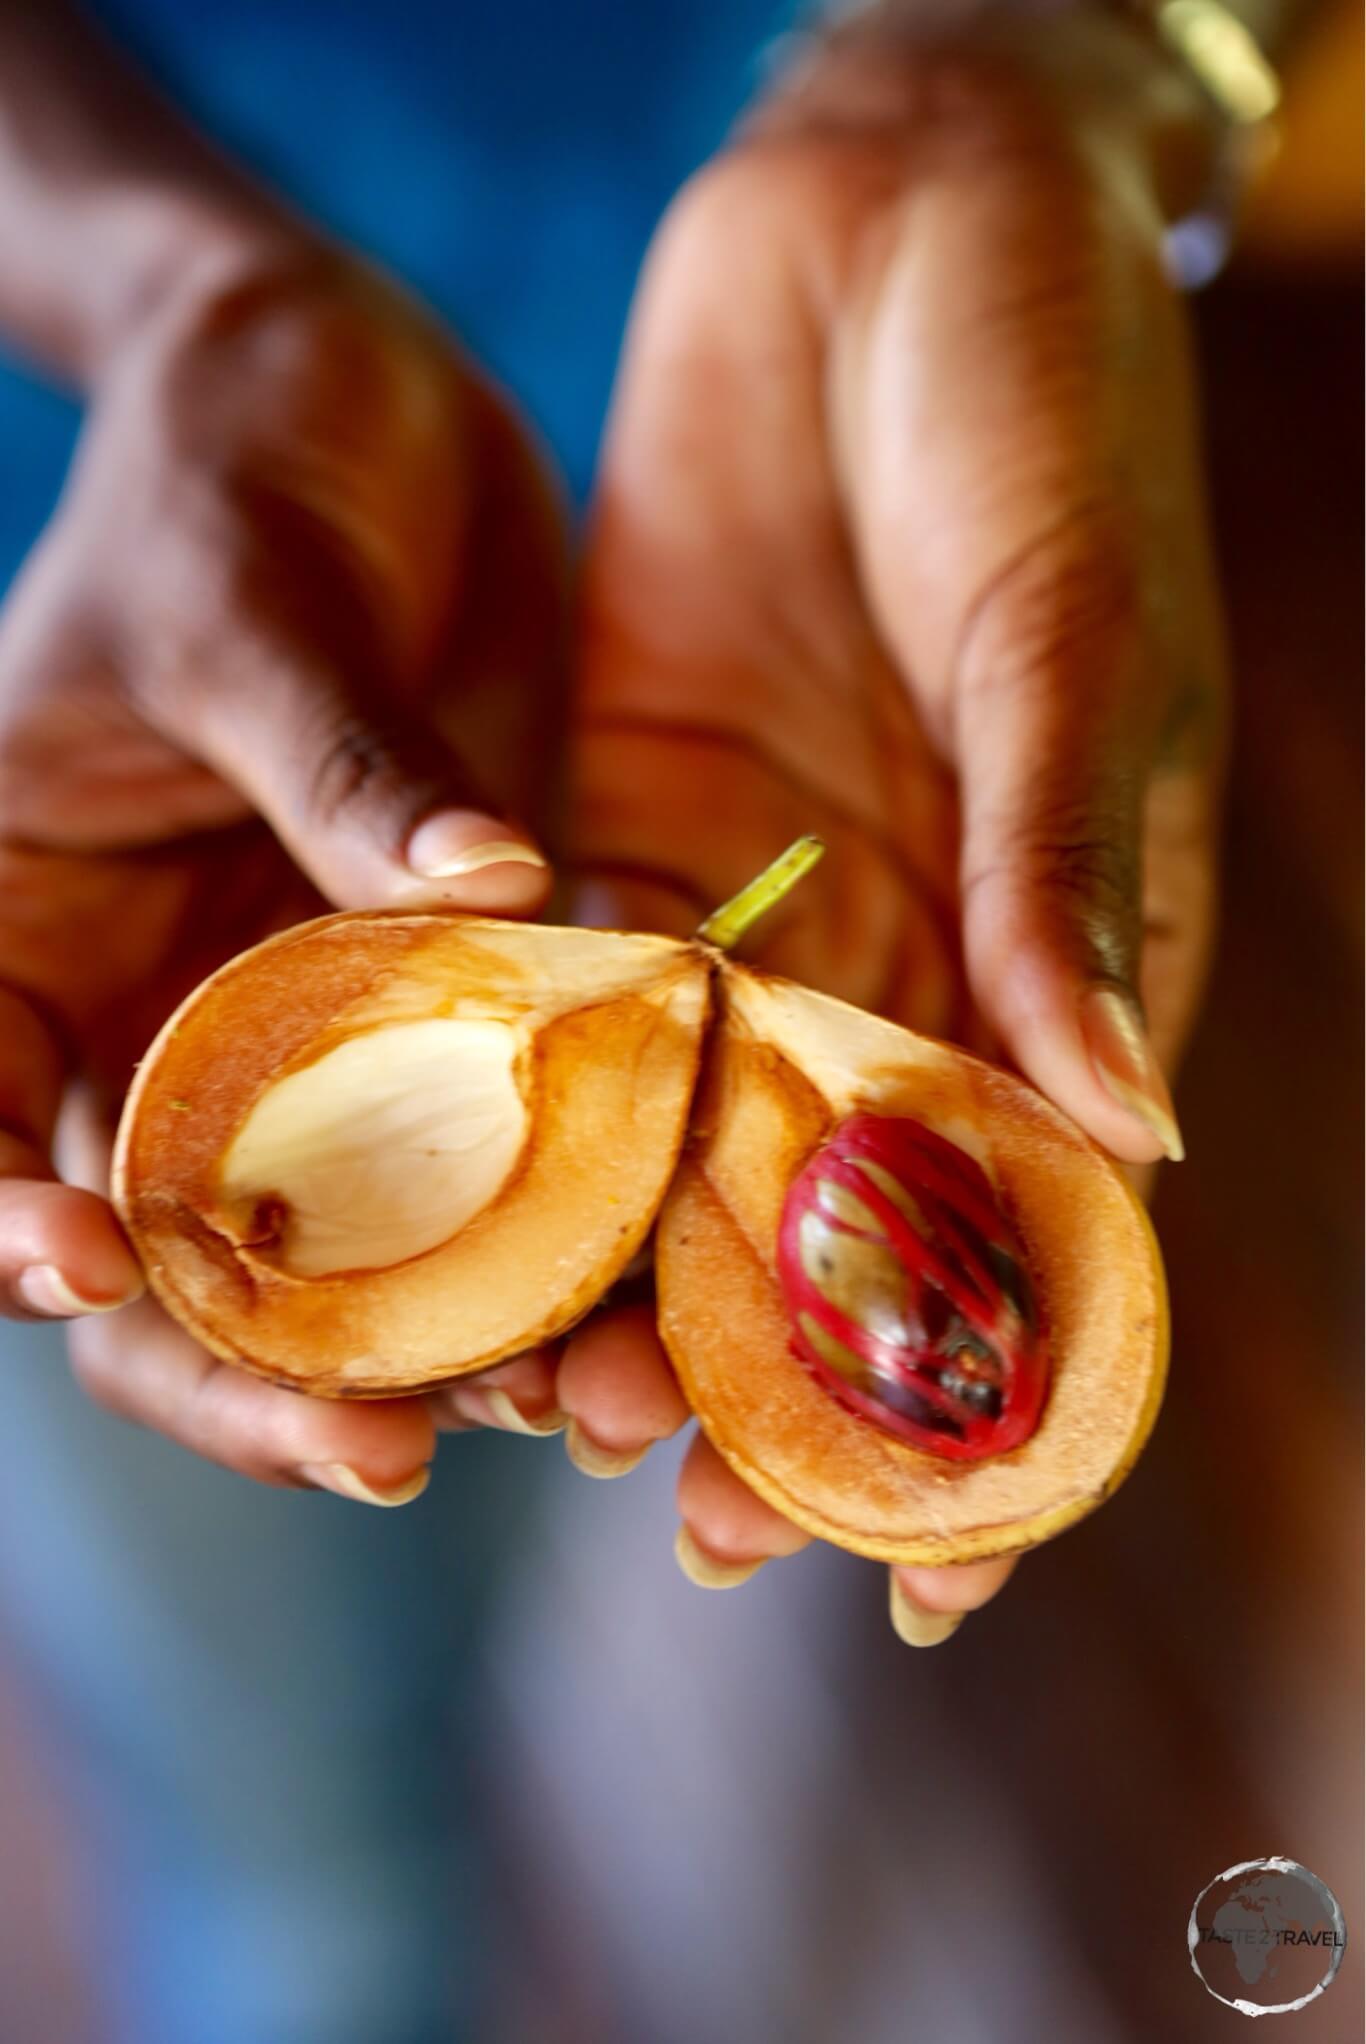 Nutmeg is Grenada's #1 export.